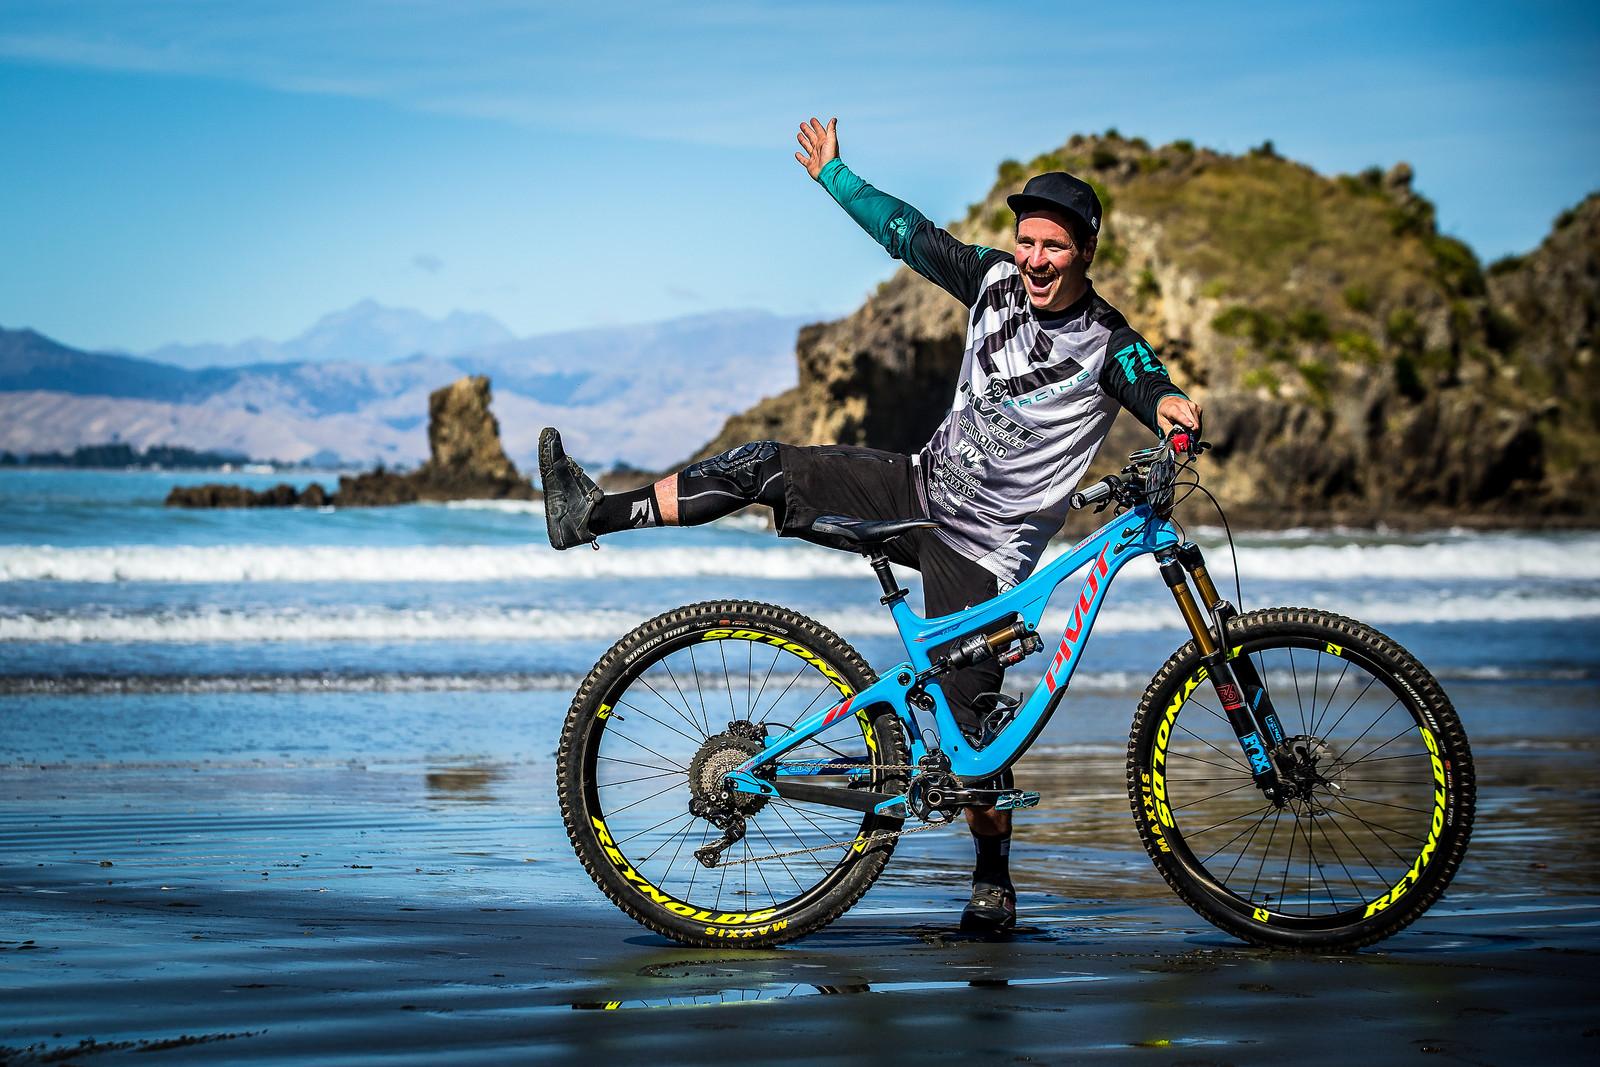 2017 NZ Enduro Pro Bikes - Rupert Chapman's Pivot Switchblade 29er - 2017 NZ Enduro Pro Bikes - They Wreck 'Em, We Check 'Em - Mountain Biking Pictures - Vital MTB